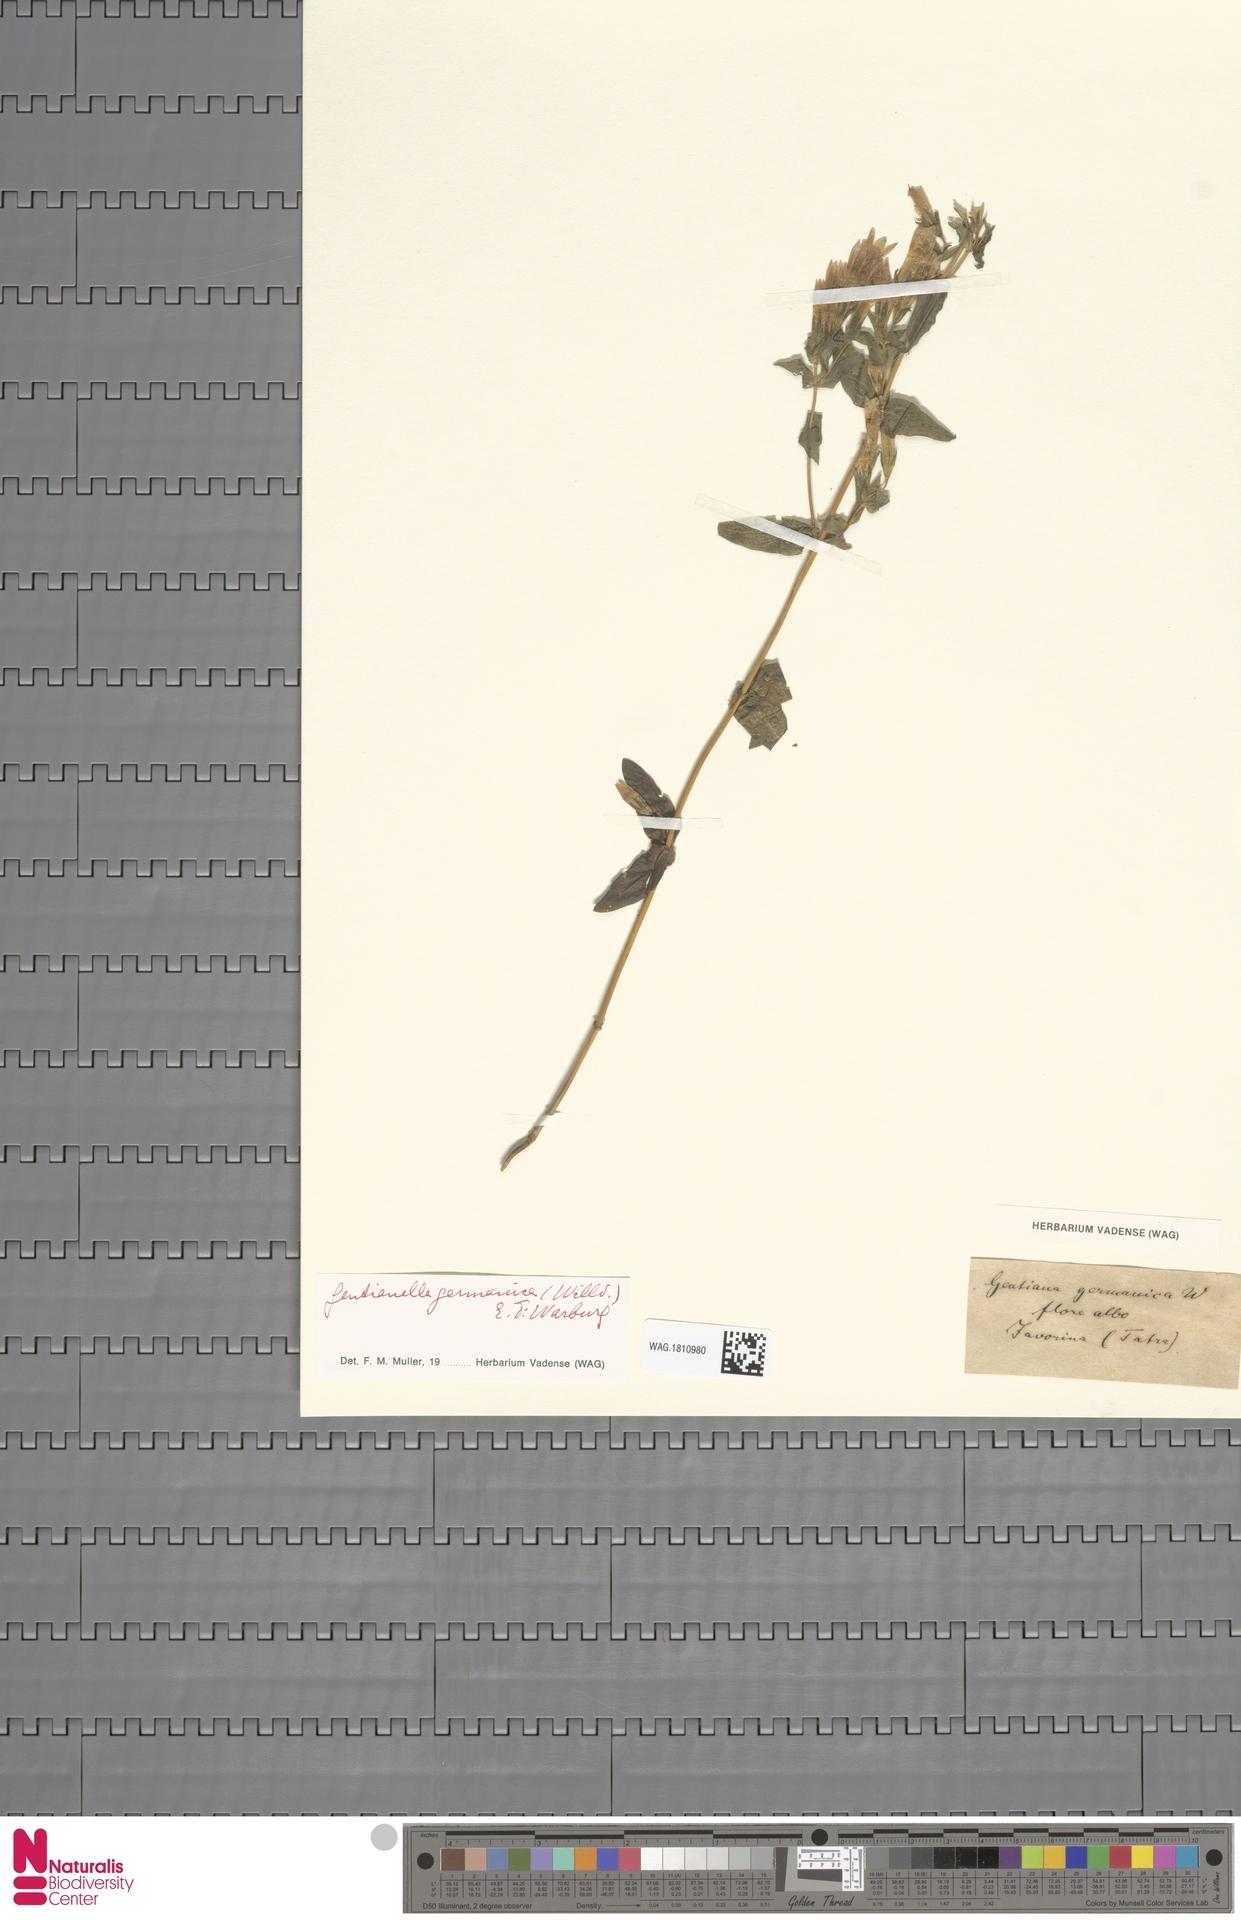 WAG.1810980   Gentianella germanica (Willd.) E.F.Warb.